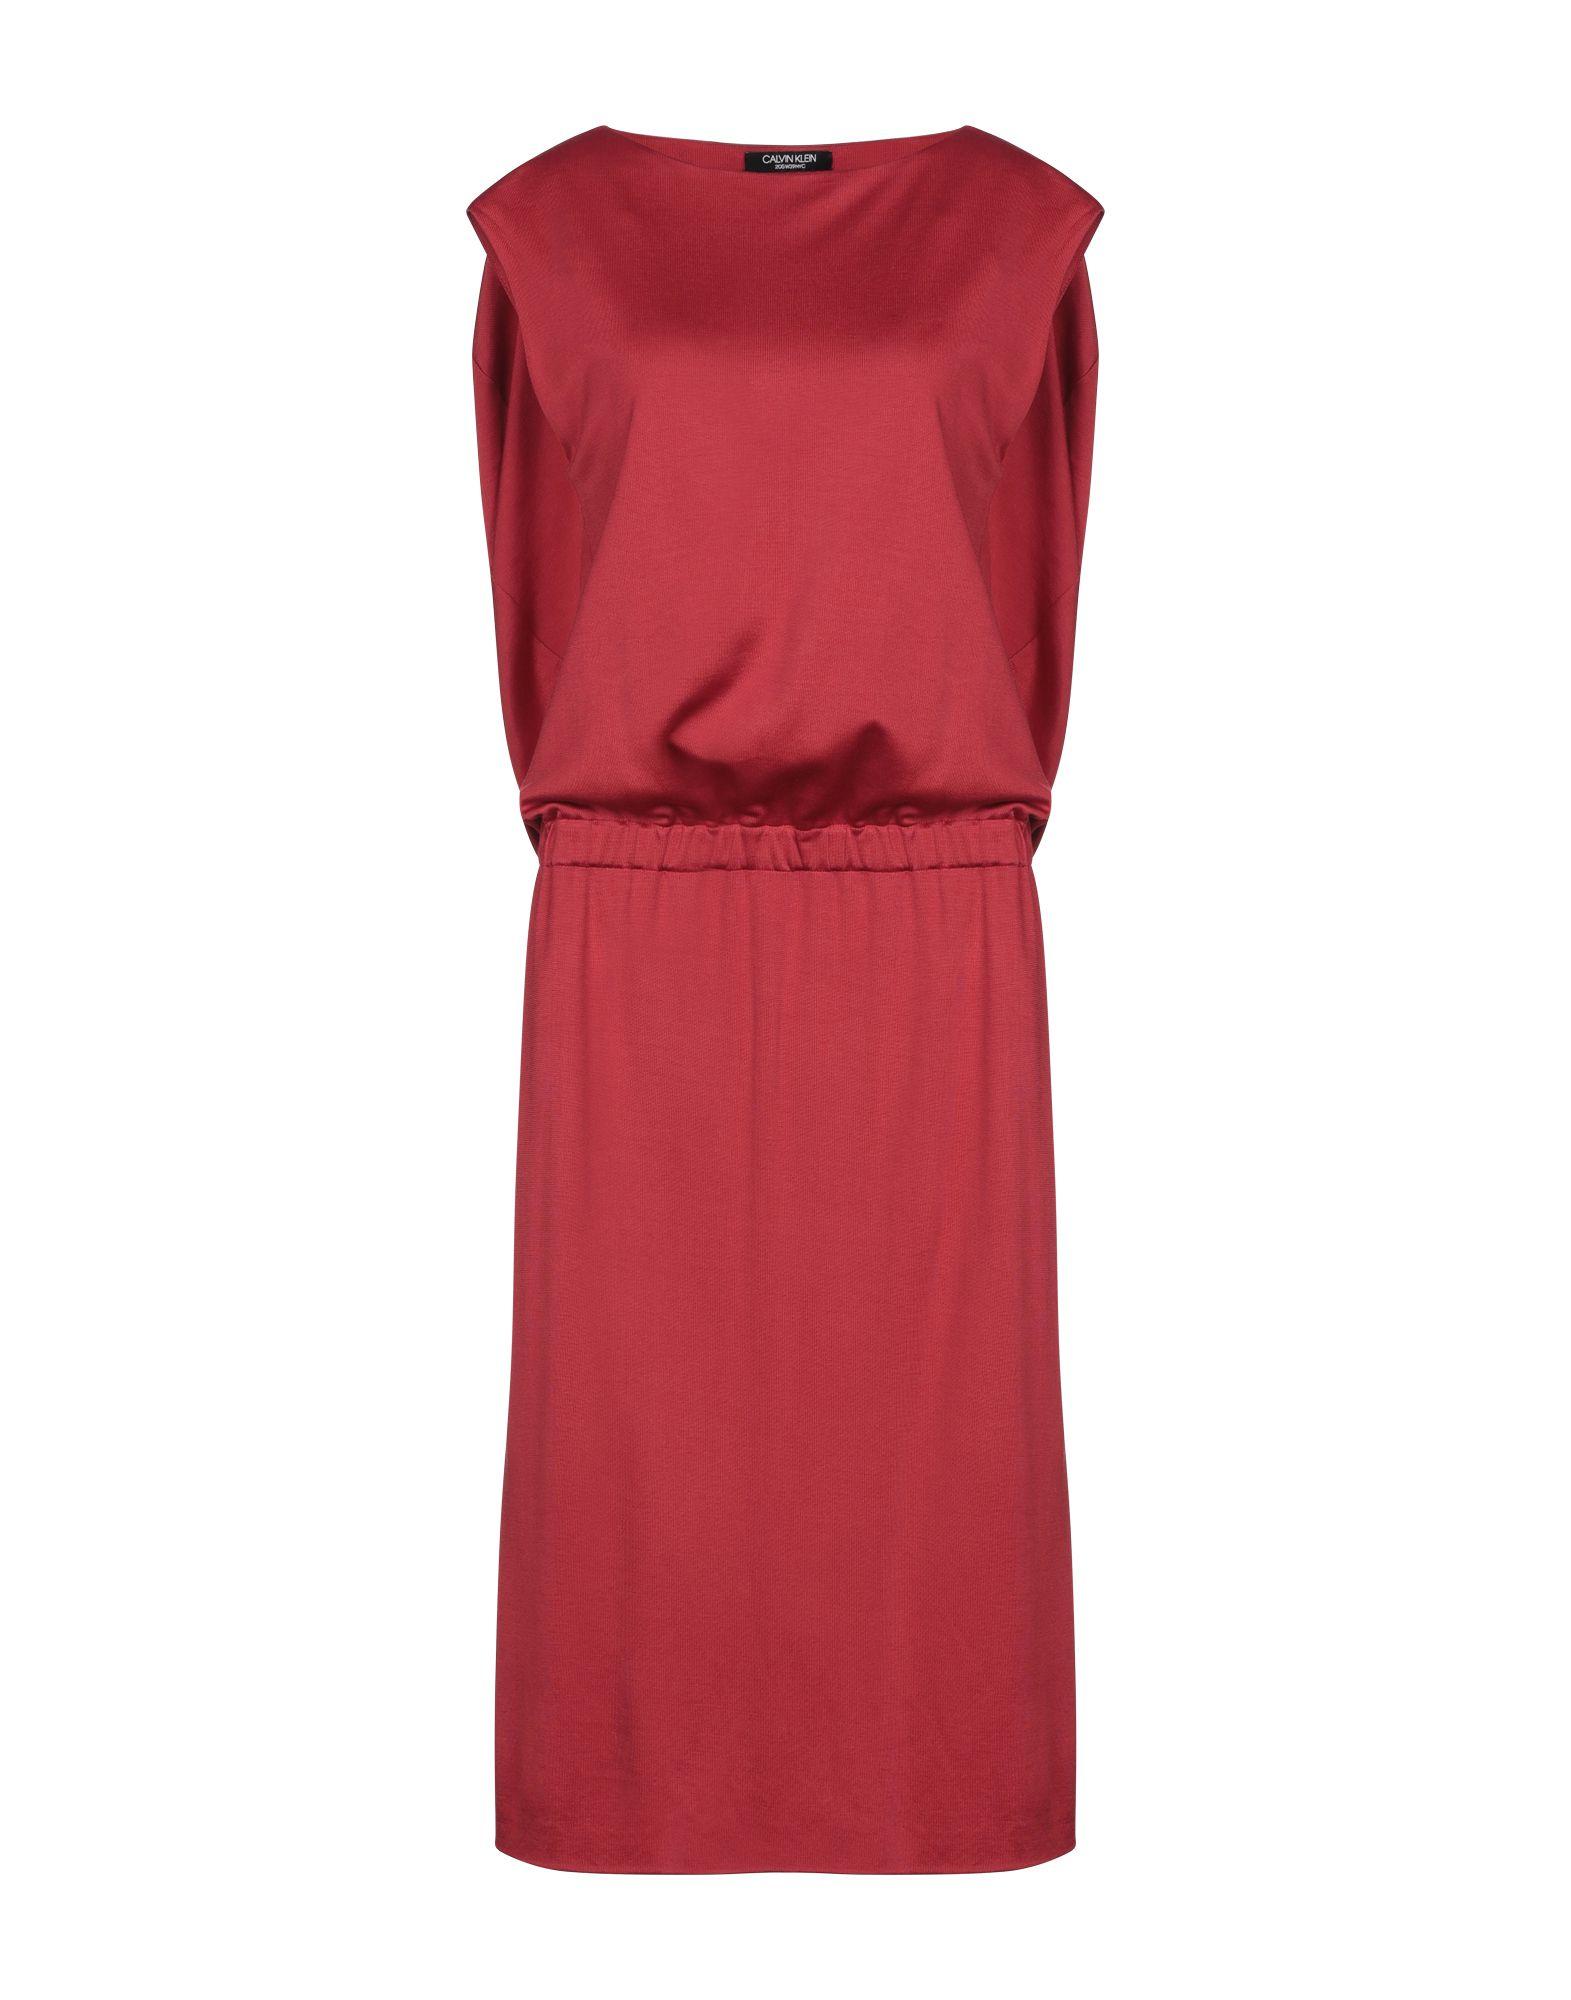 CALVIN KLEIN 205W39NYC Платье длиной 3/4